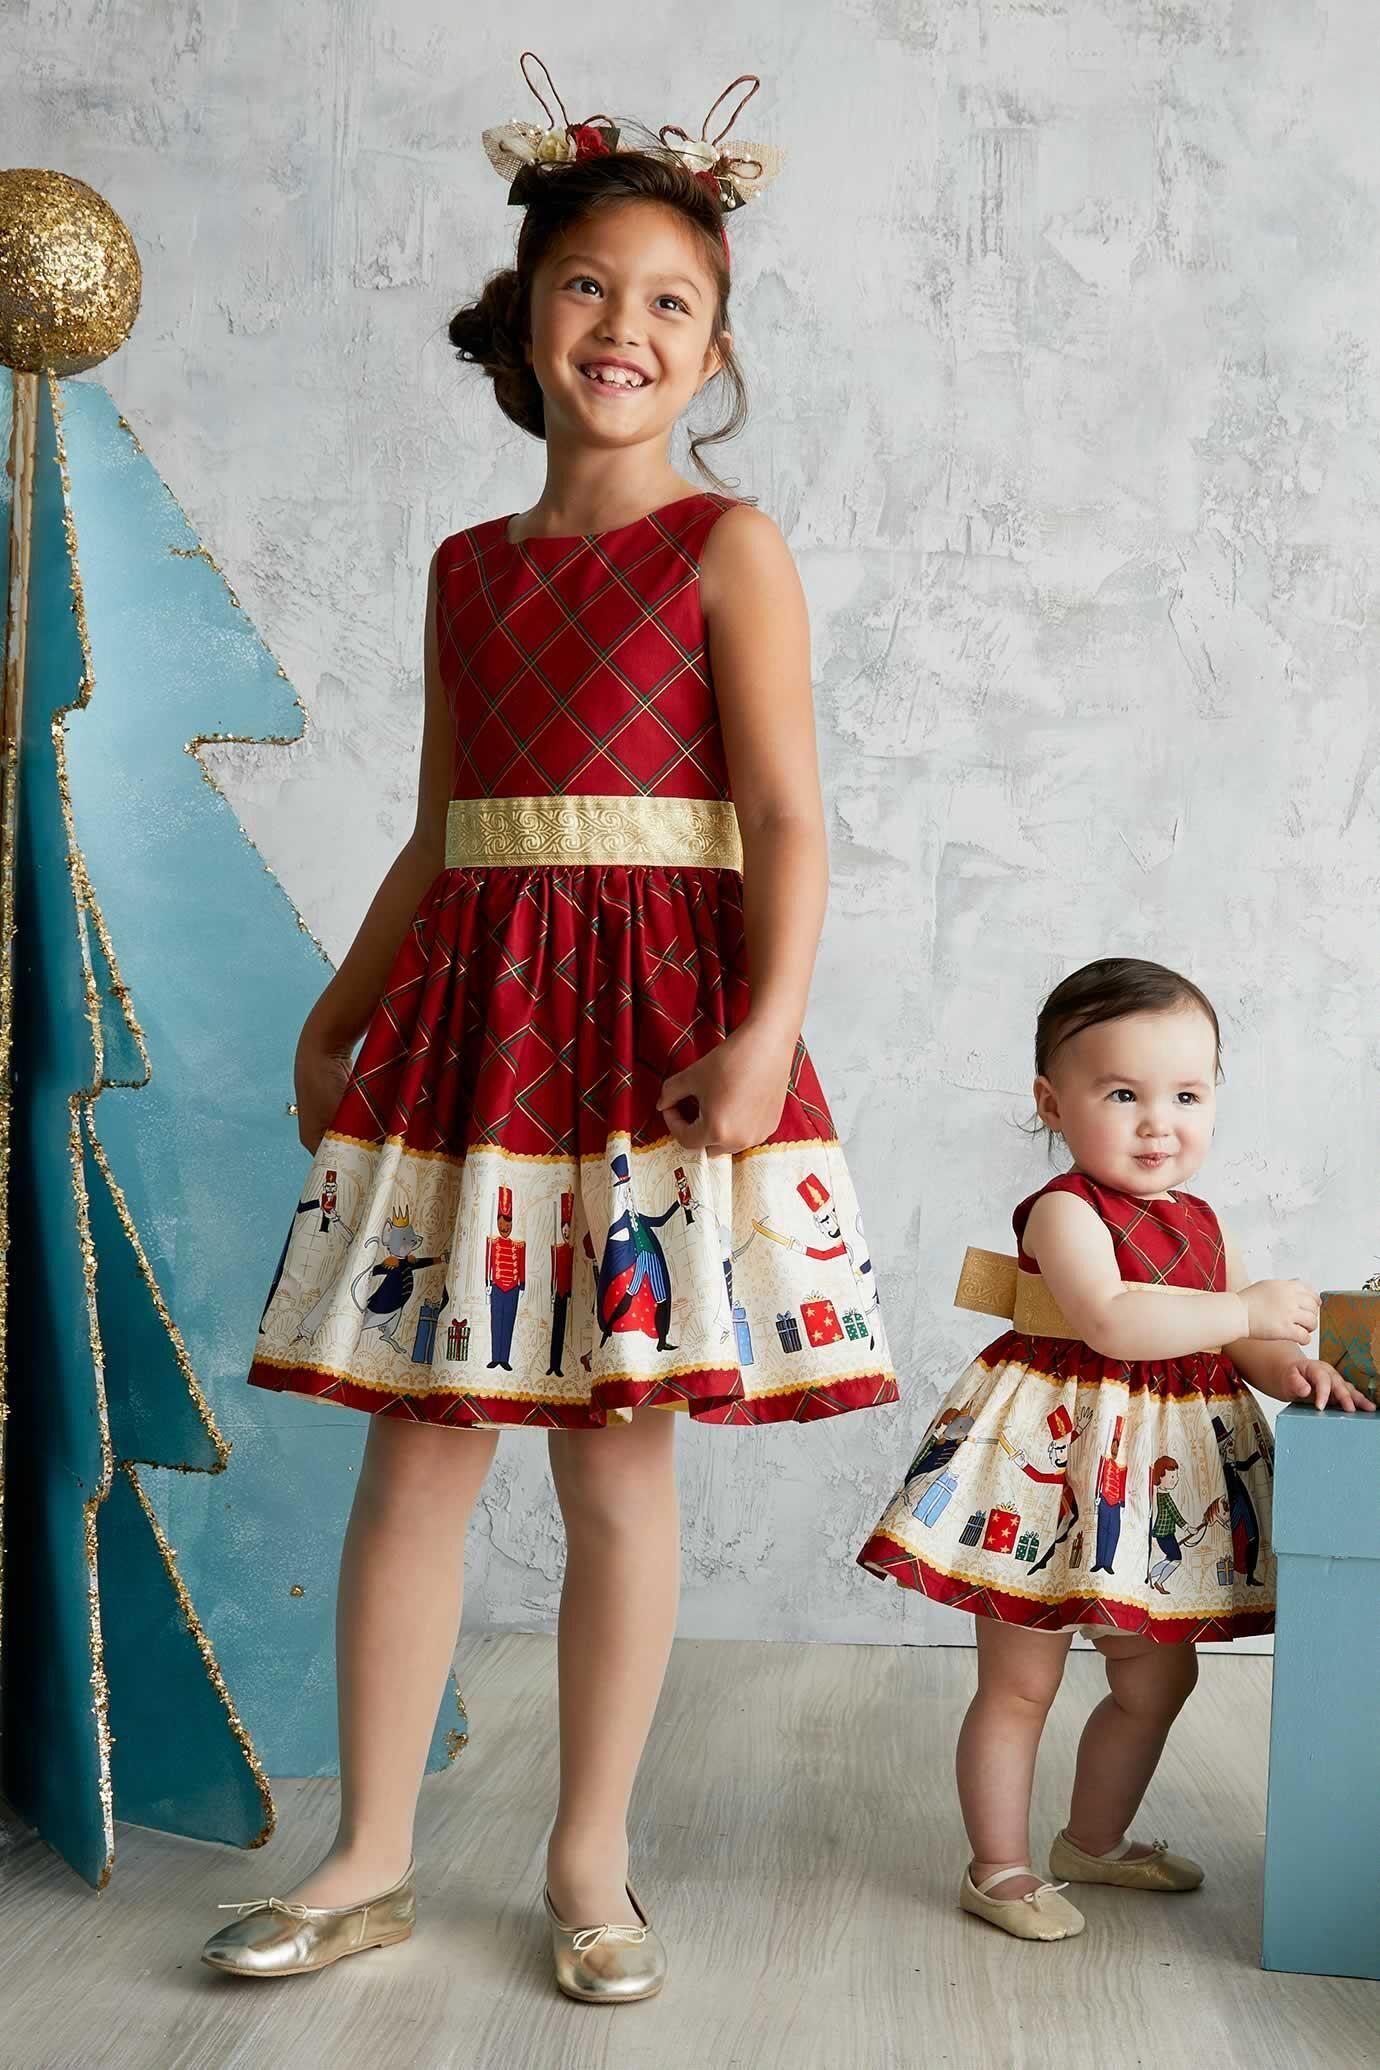 2Pc//Set Toddler Kids Baby Girls Velvet Shirt+Plaid Skirt Dress Outfits Christmas Clothes Set